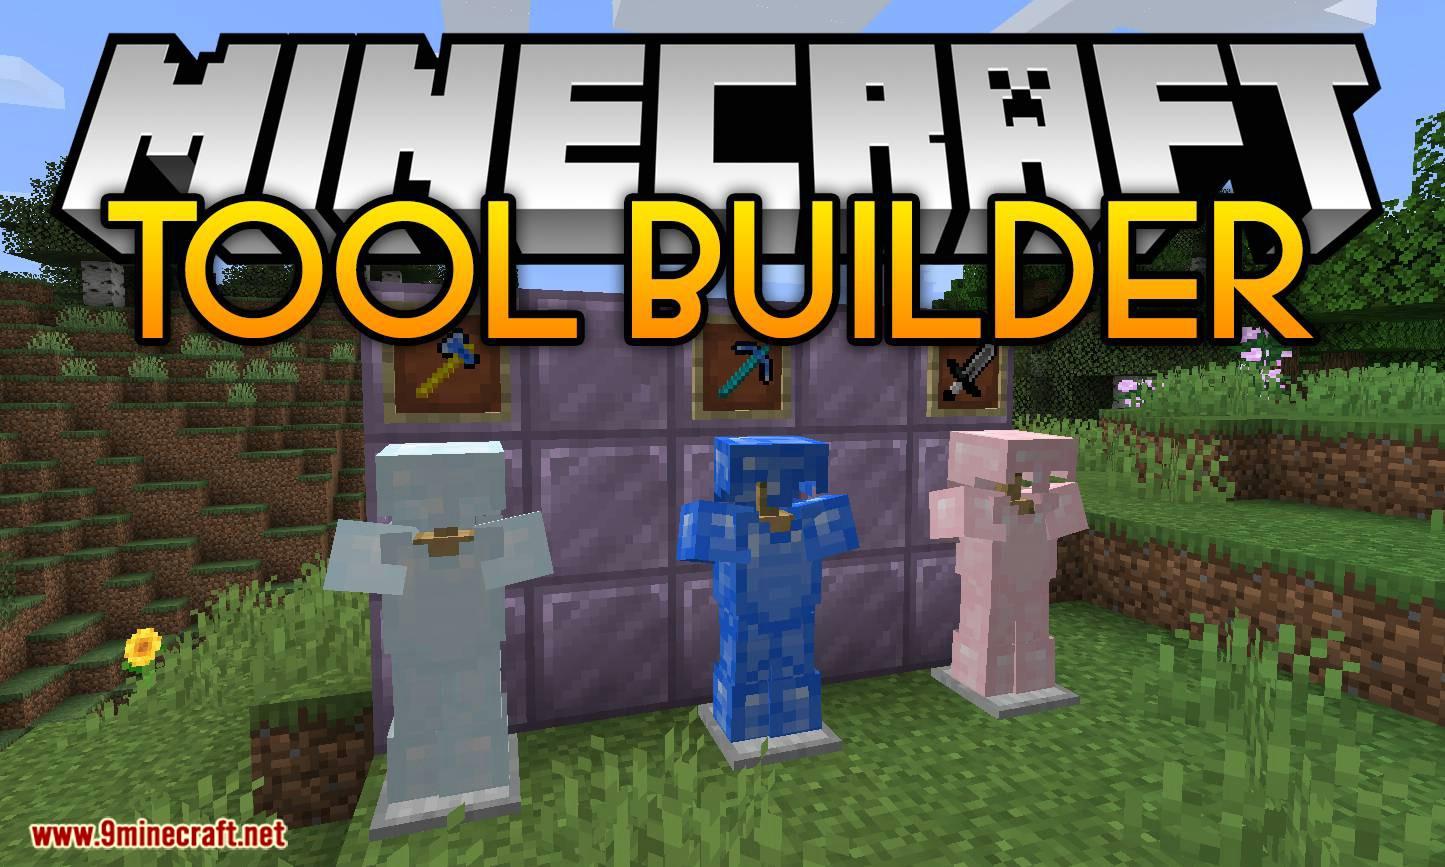 Tool Builder mod for minecraft logo